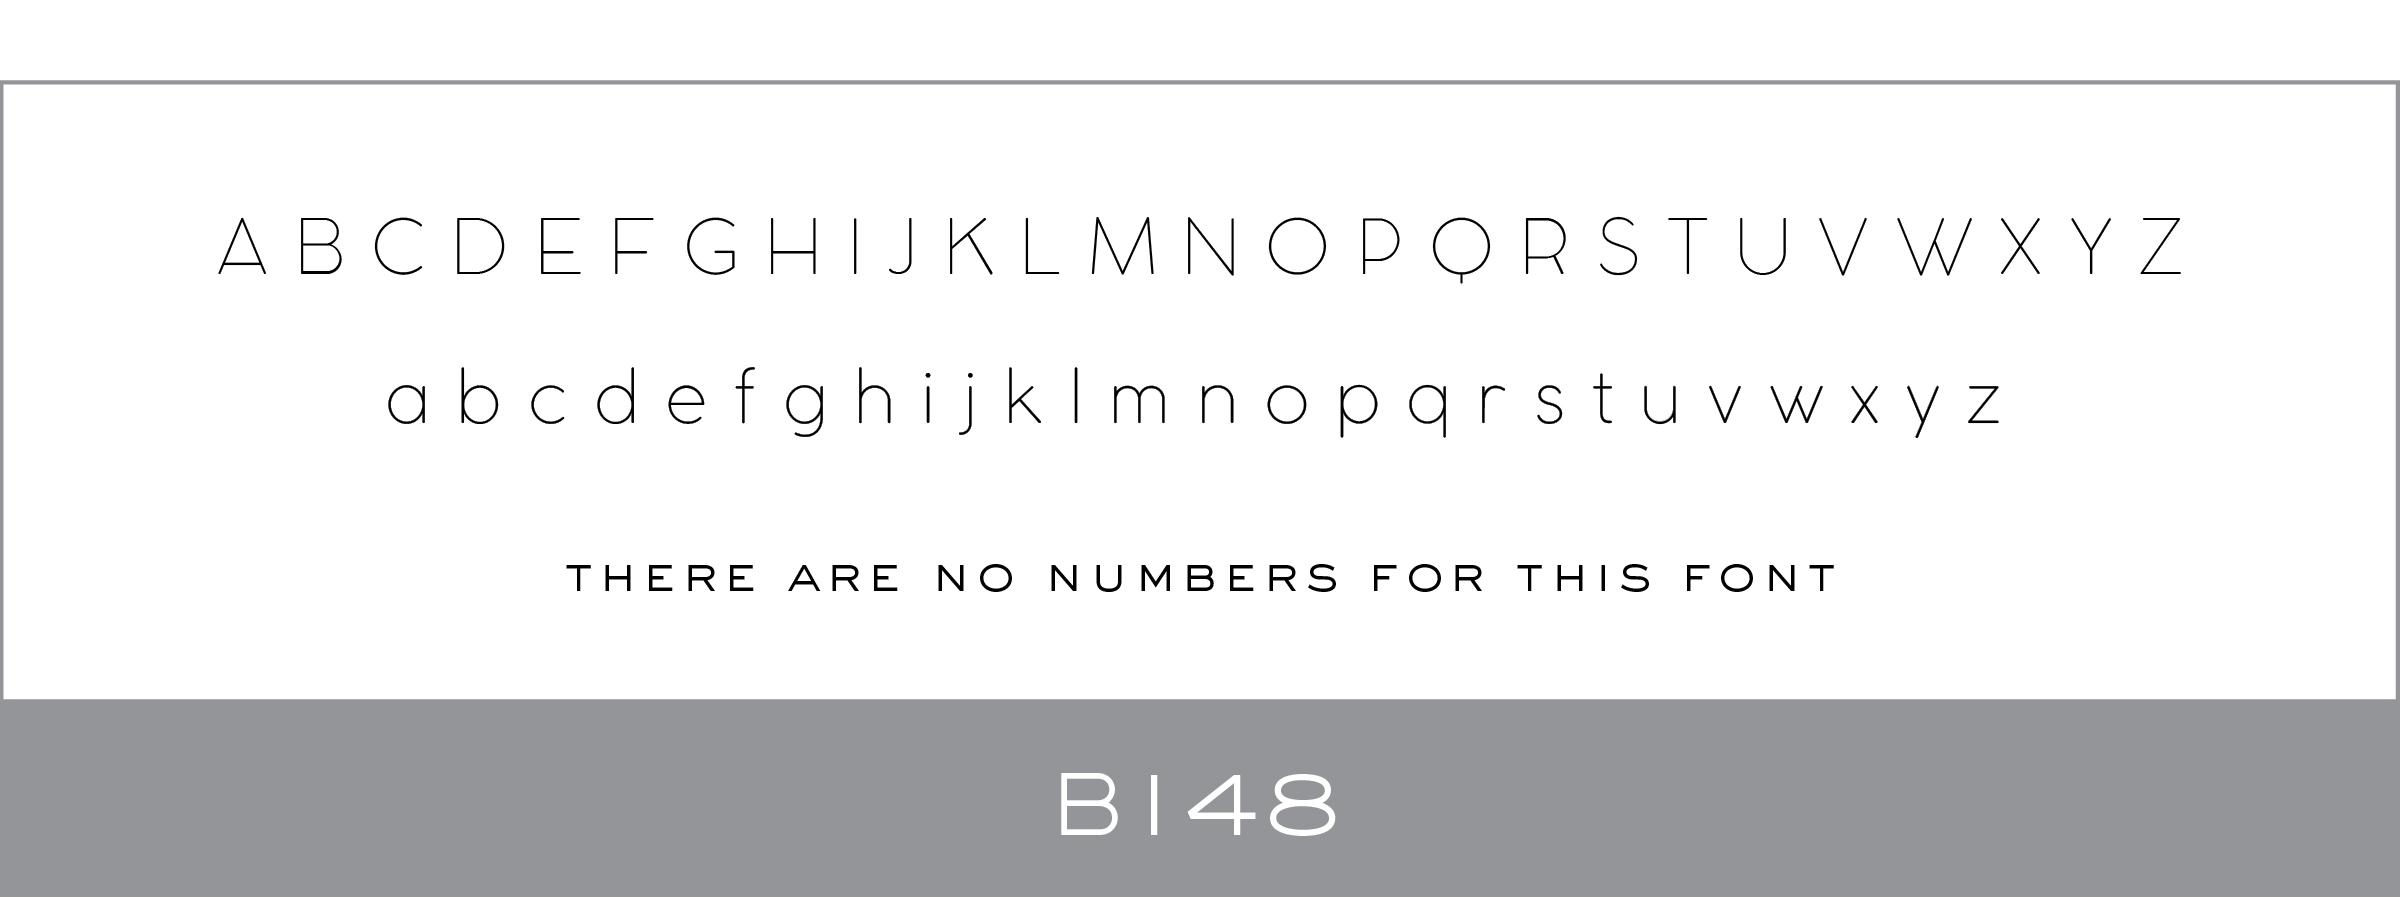 B148_Haute_Papier_Font.jpg